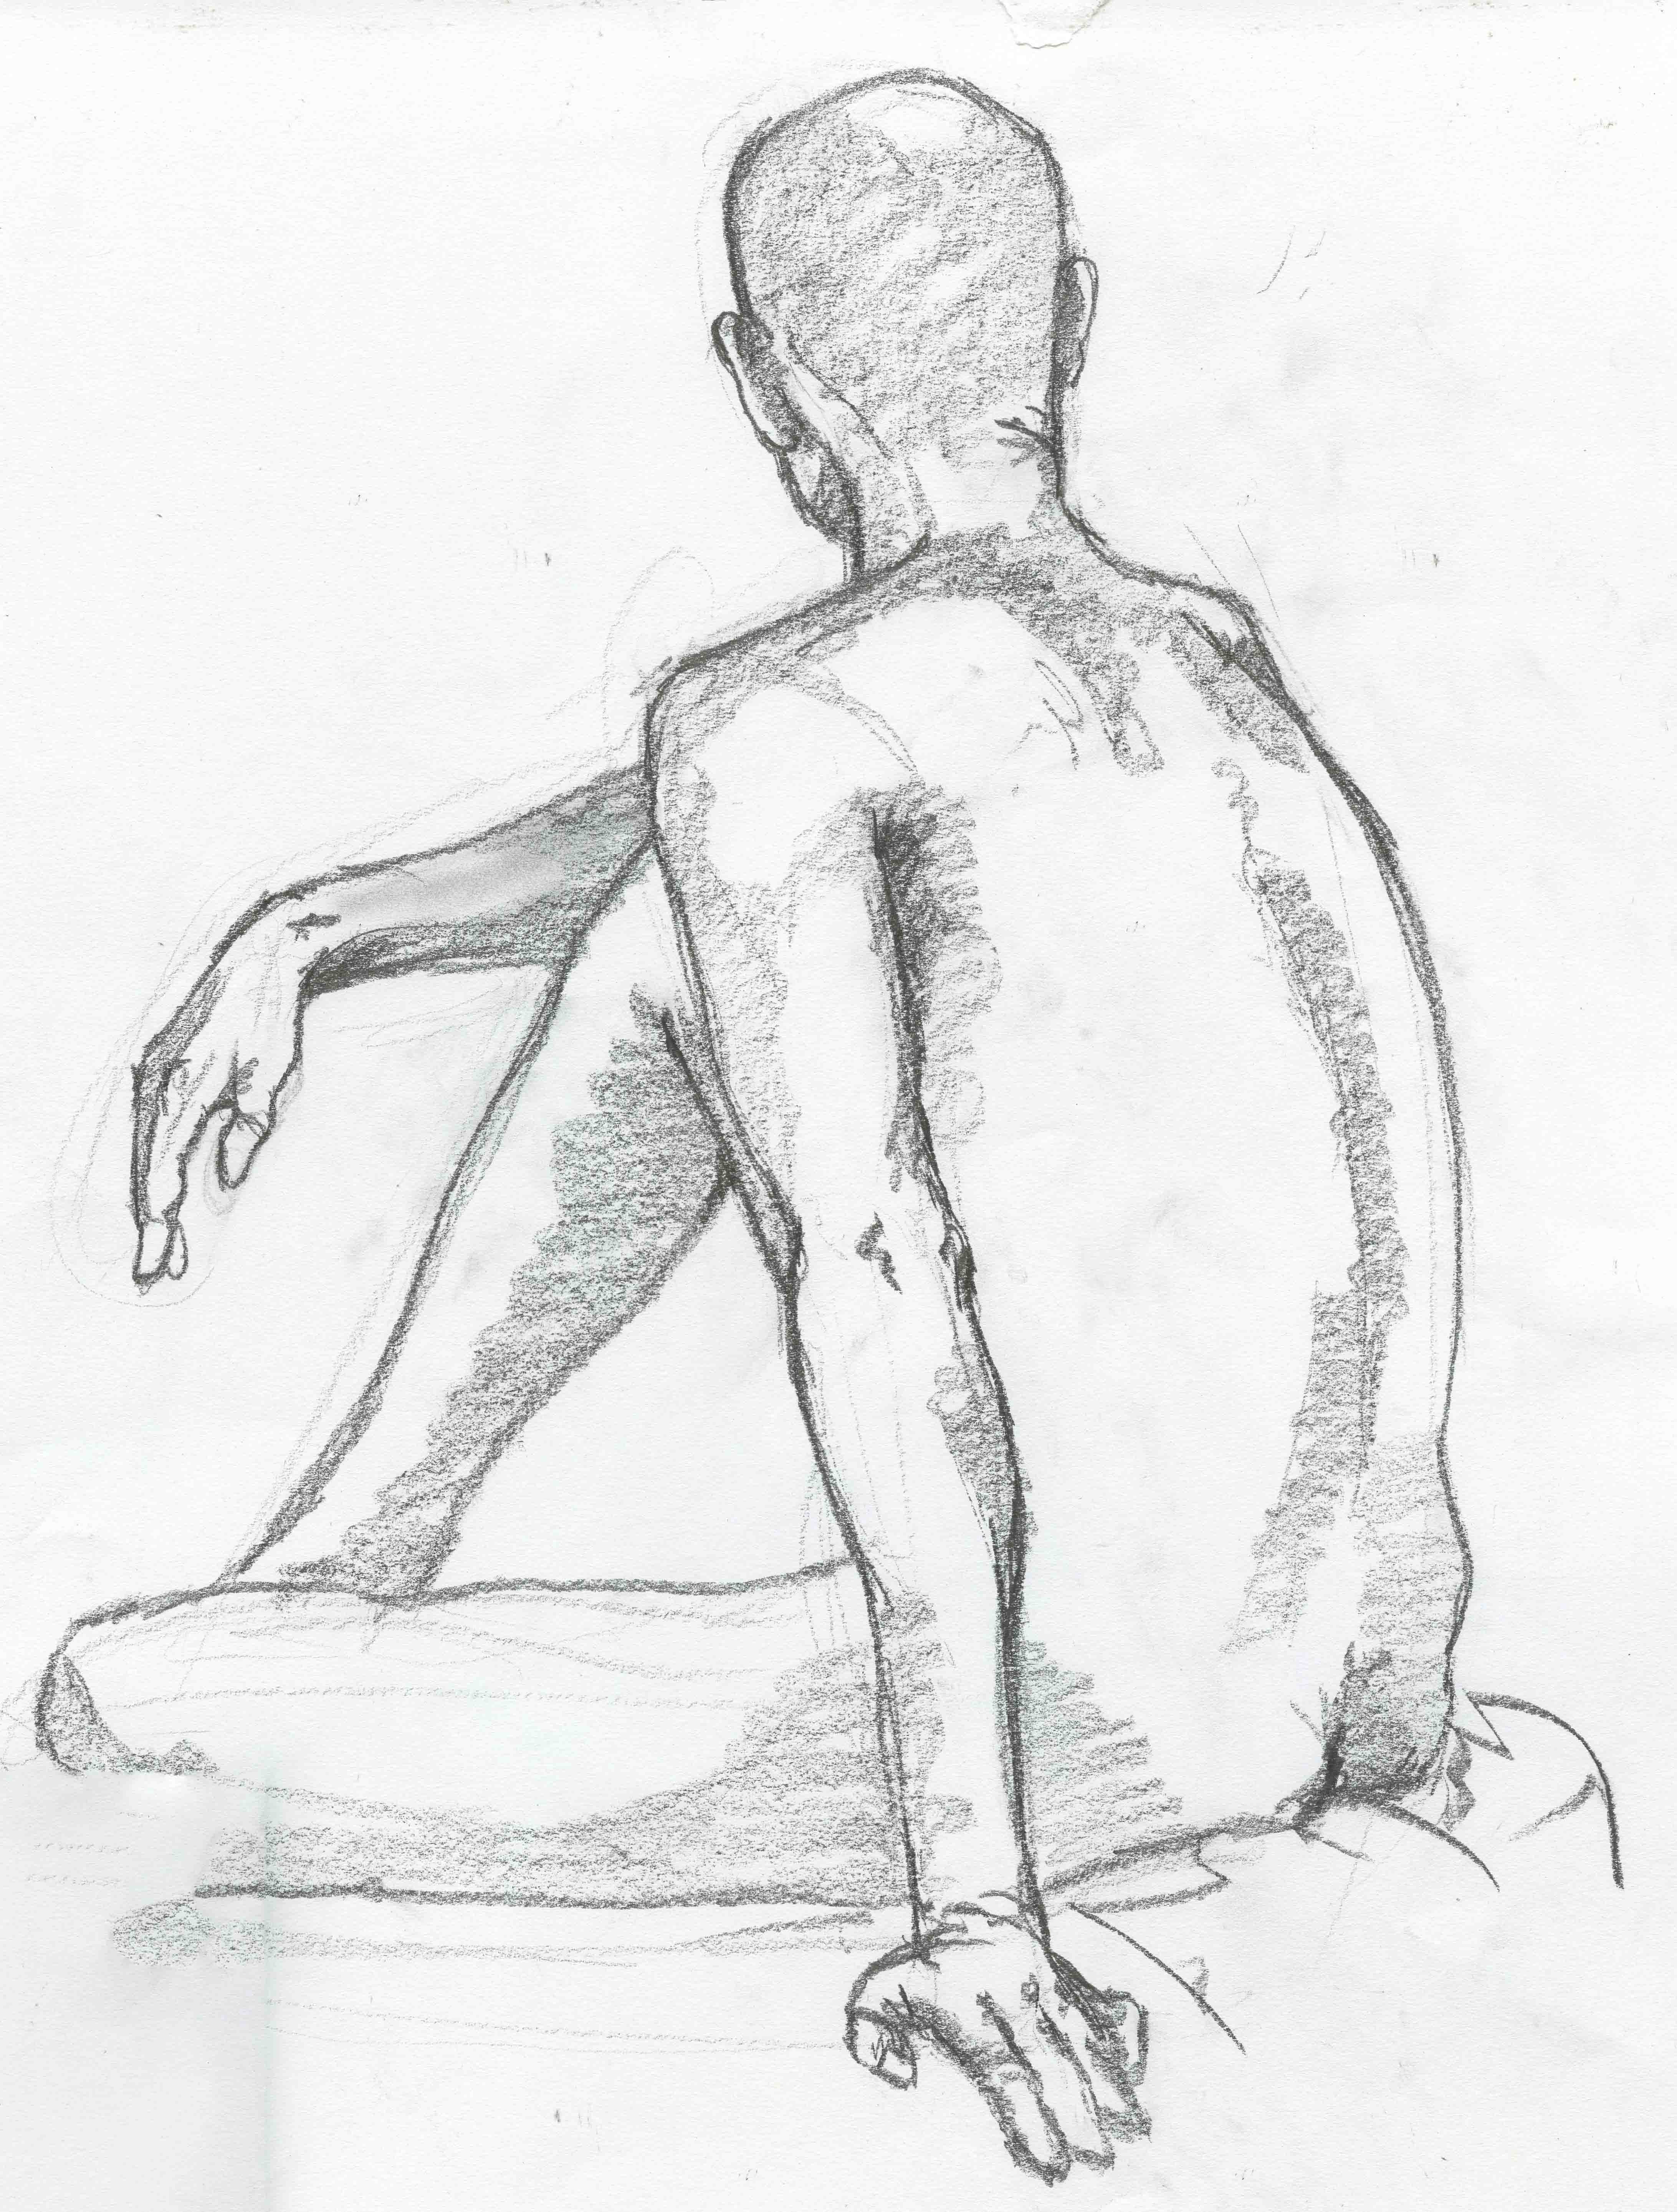 Noomis - Etudes, croquis & Wip [ Nudité ] - Page 6 160920112743416017